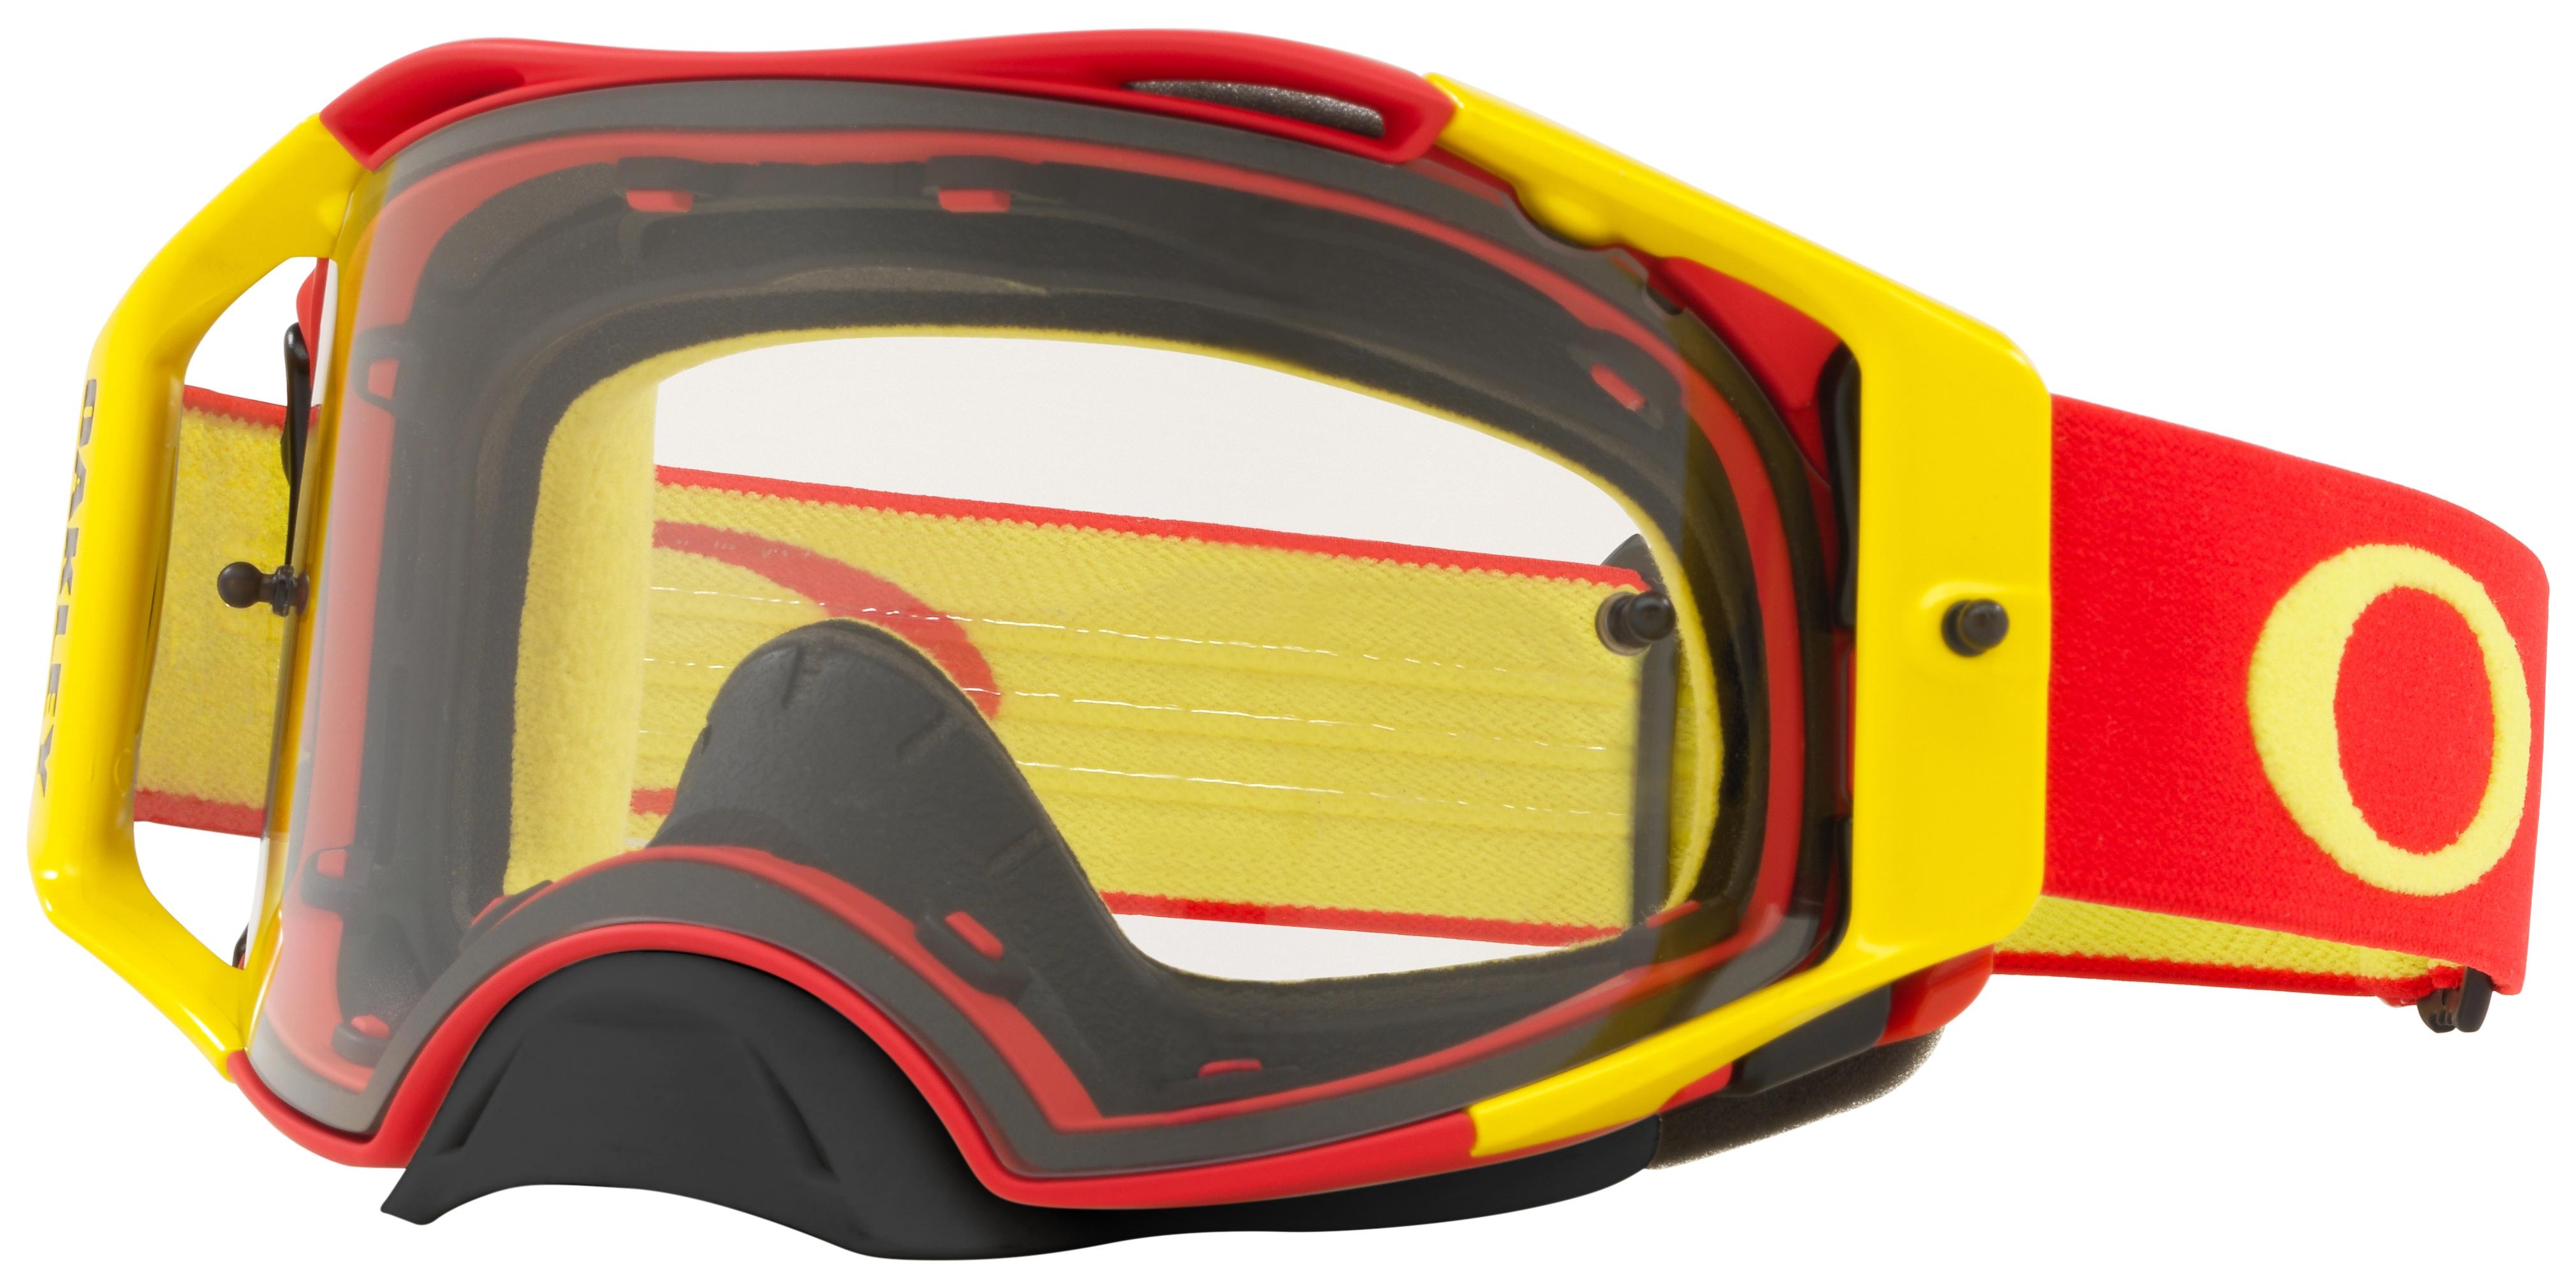 96b5eca0db Oakley Airbrake MX Goggles - Cycle Gear